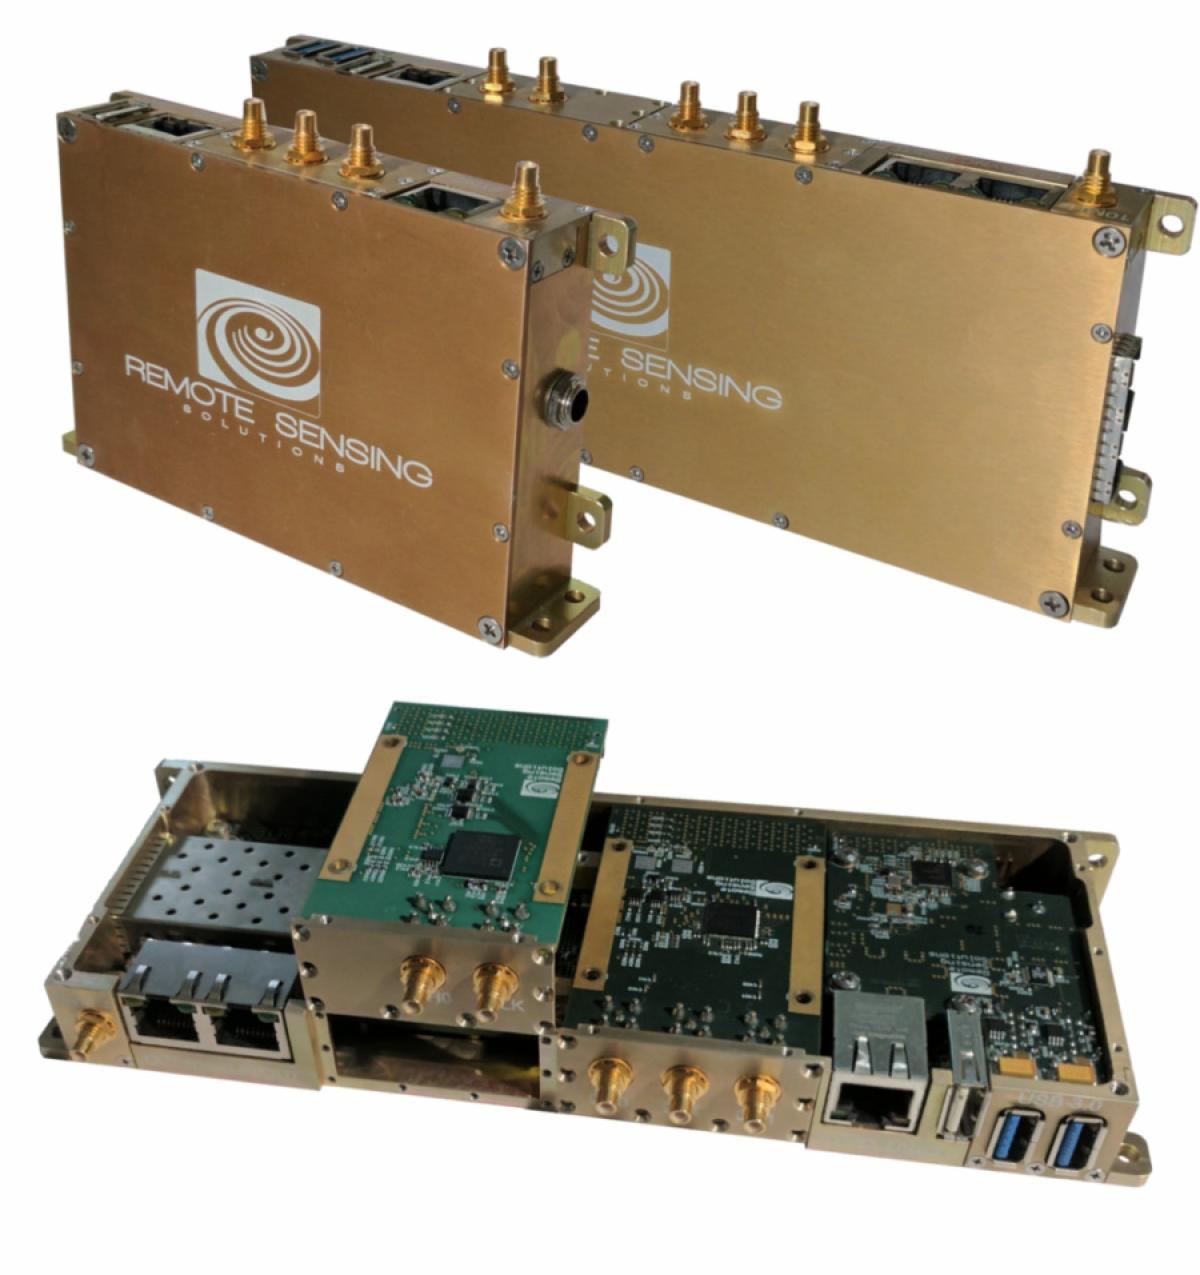 Digital Radar Subsystem Modules Are SWAP+C Optimized